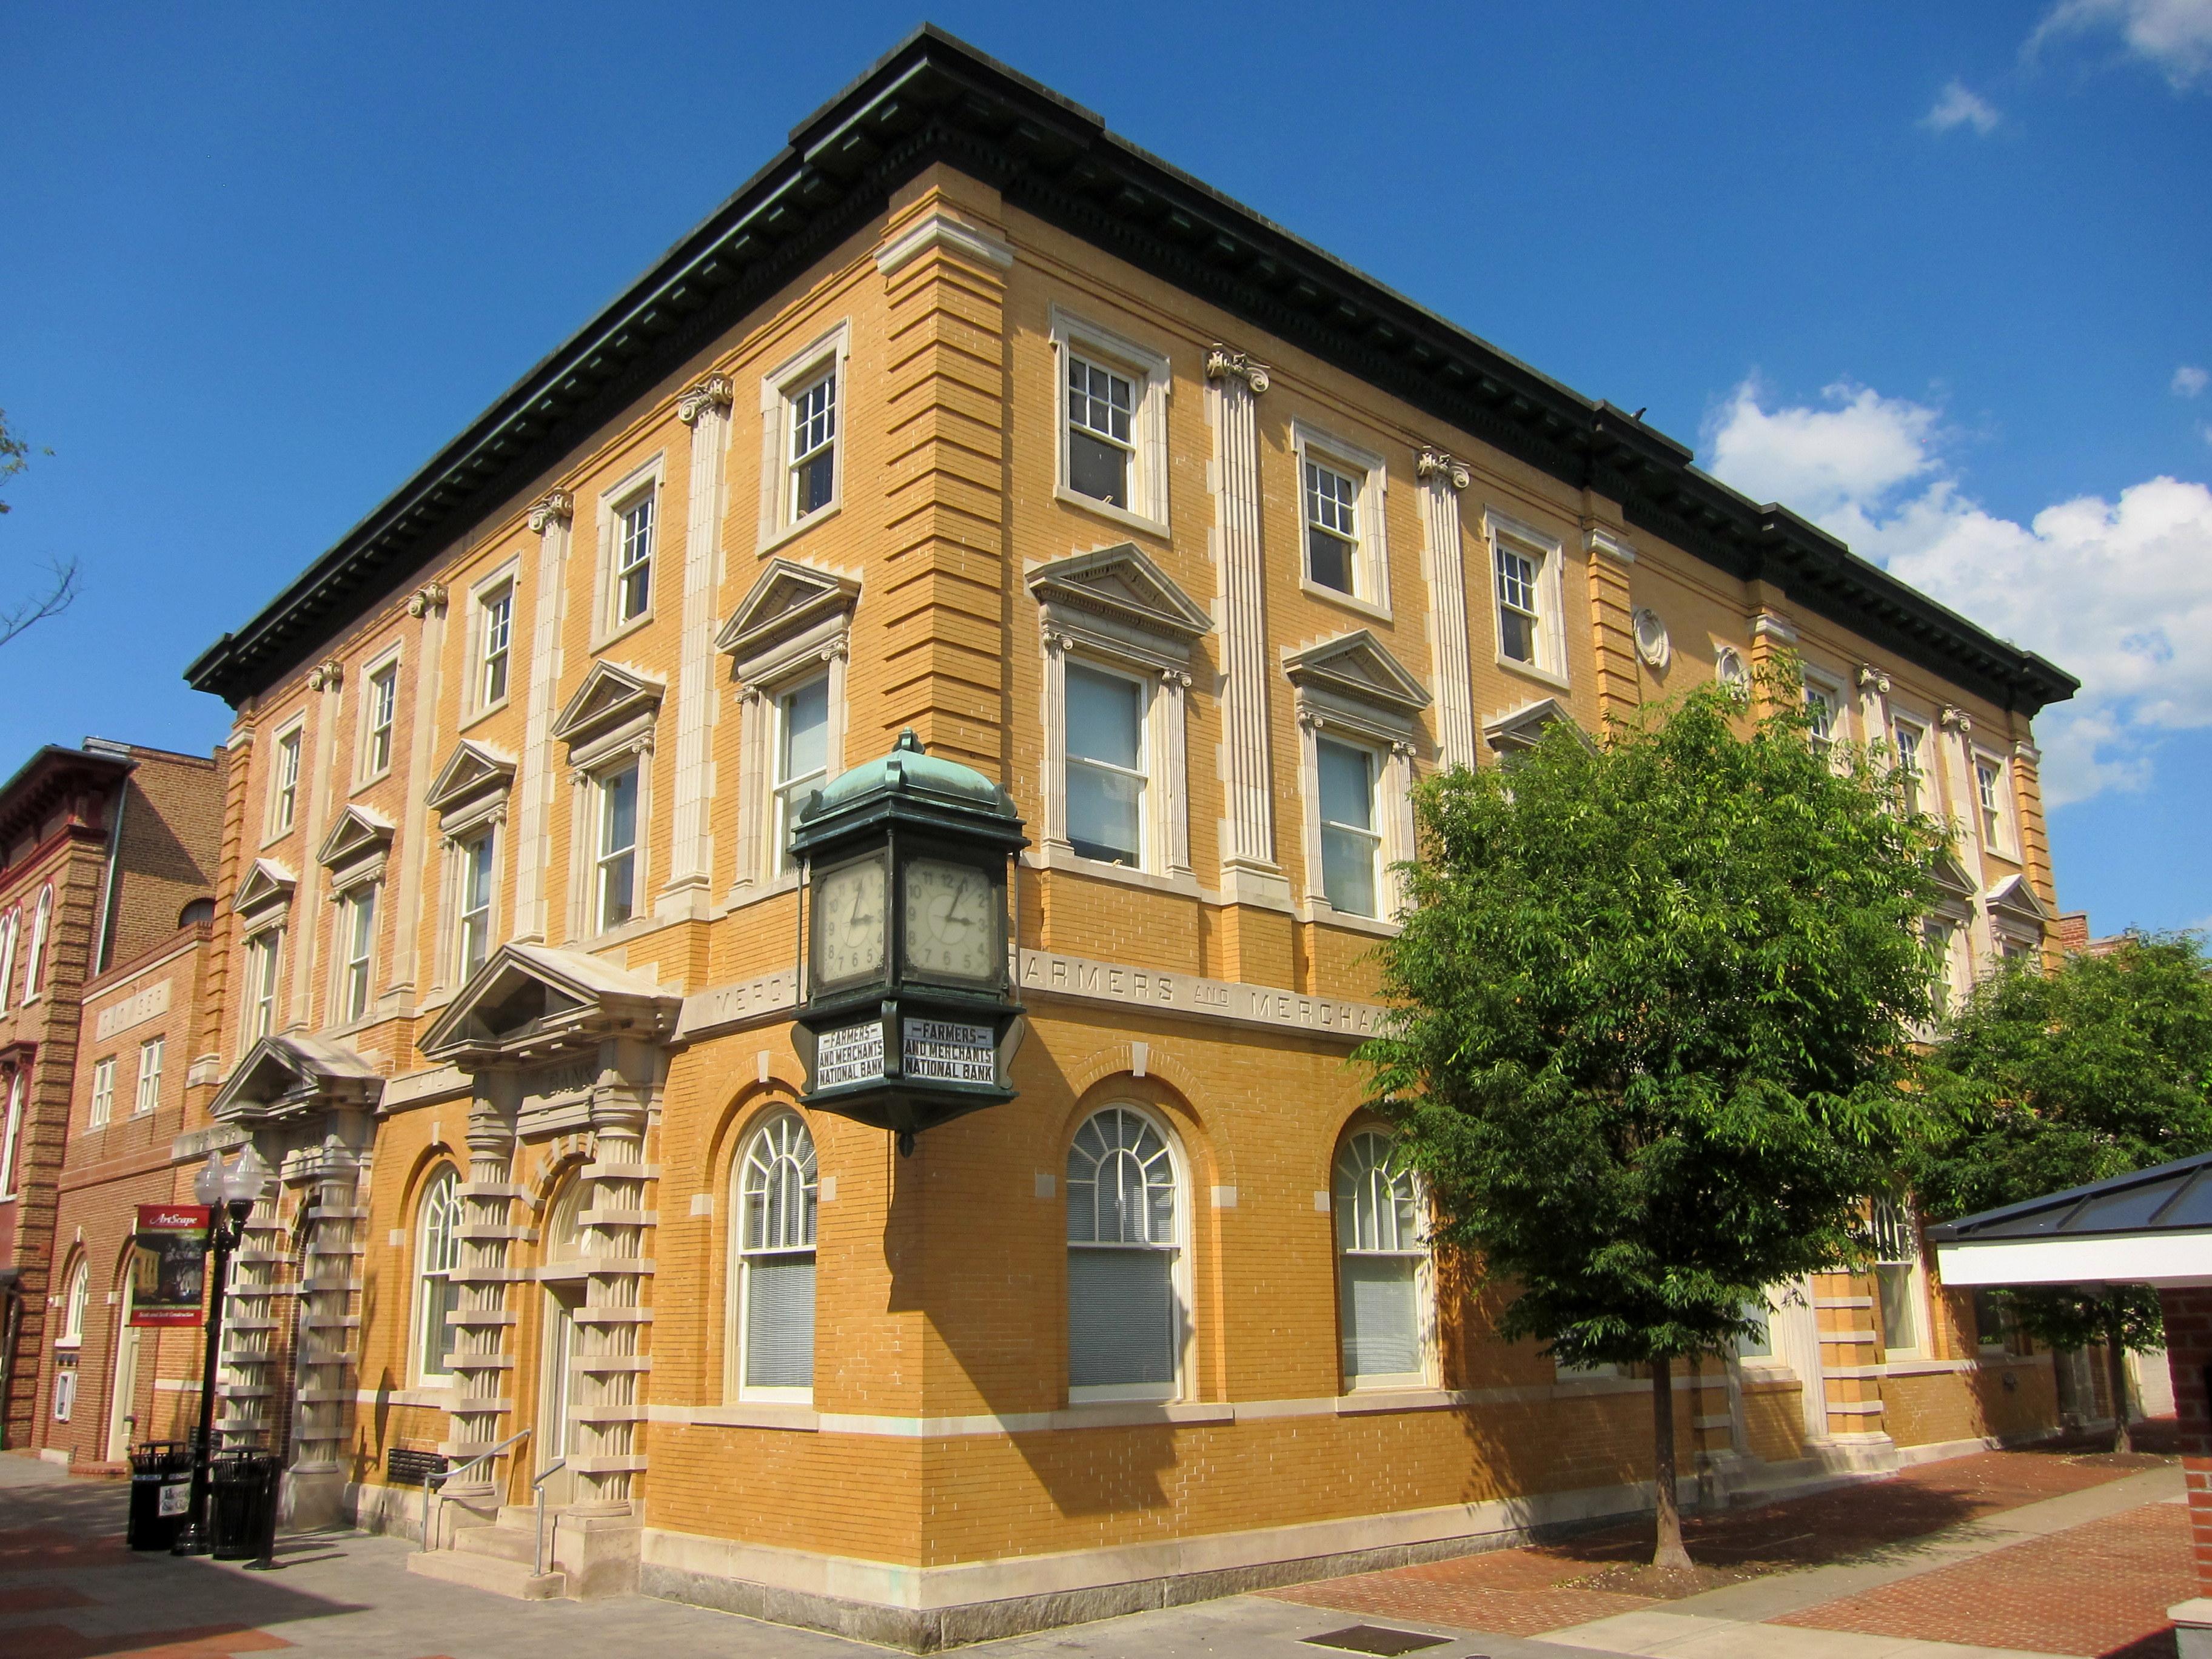 File:Farmers and Merchants Bank (Winchester, Virginia) jpg